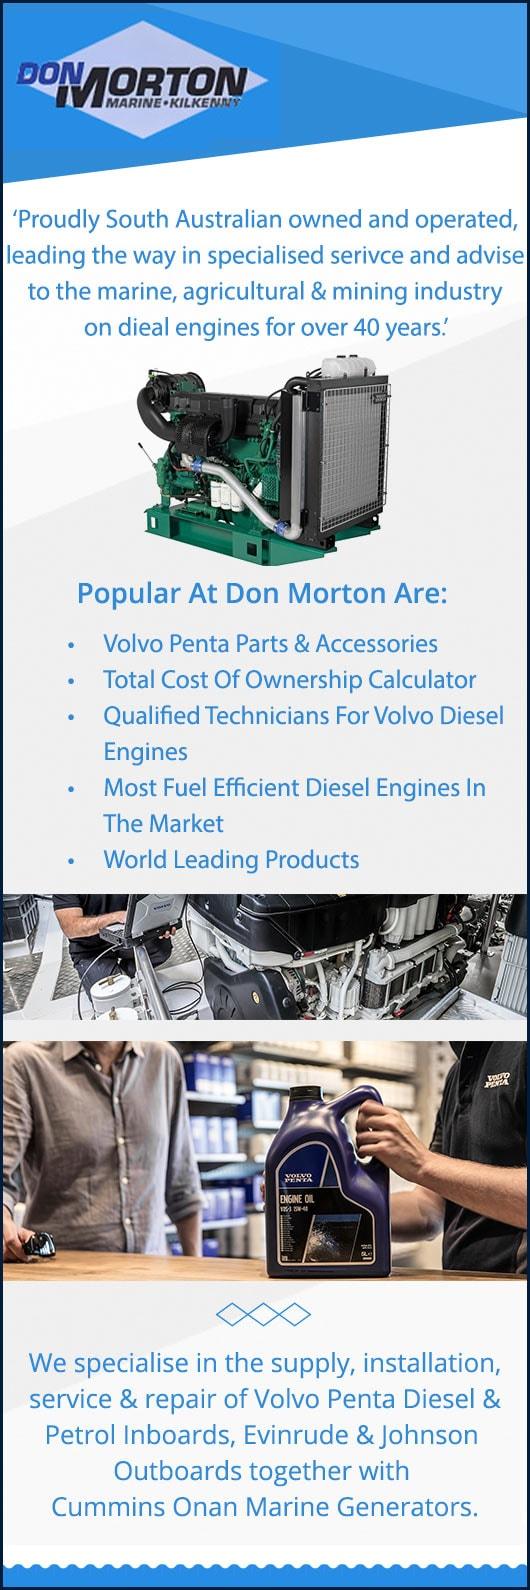 Don Morton Marine Pty Ltd - Diesel Engines, Parts